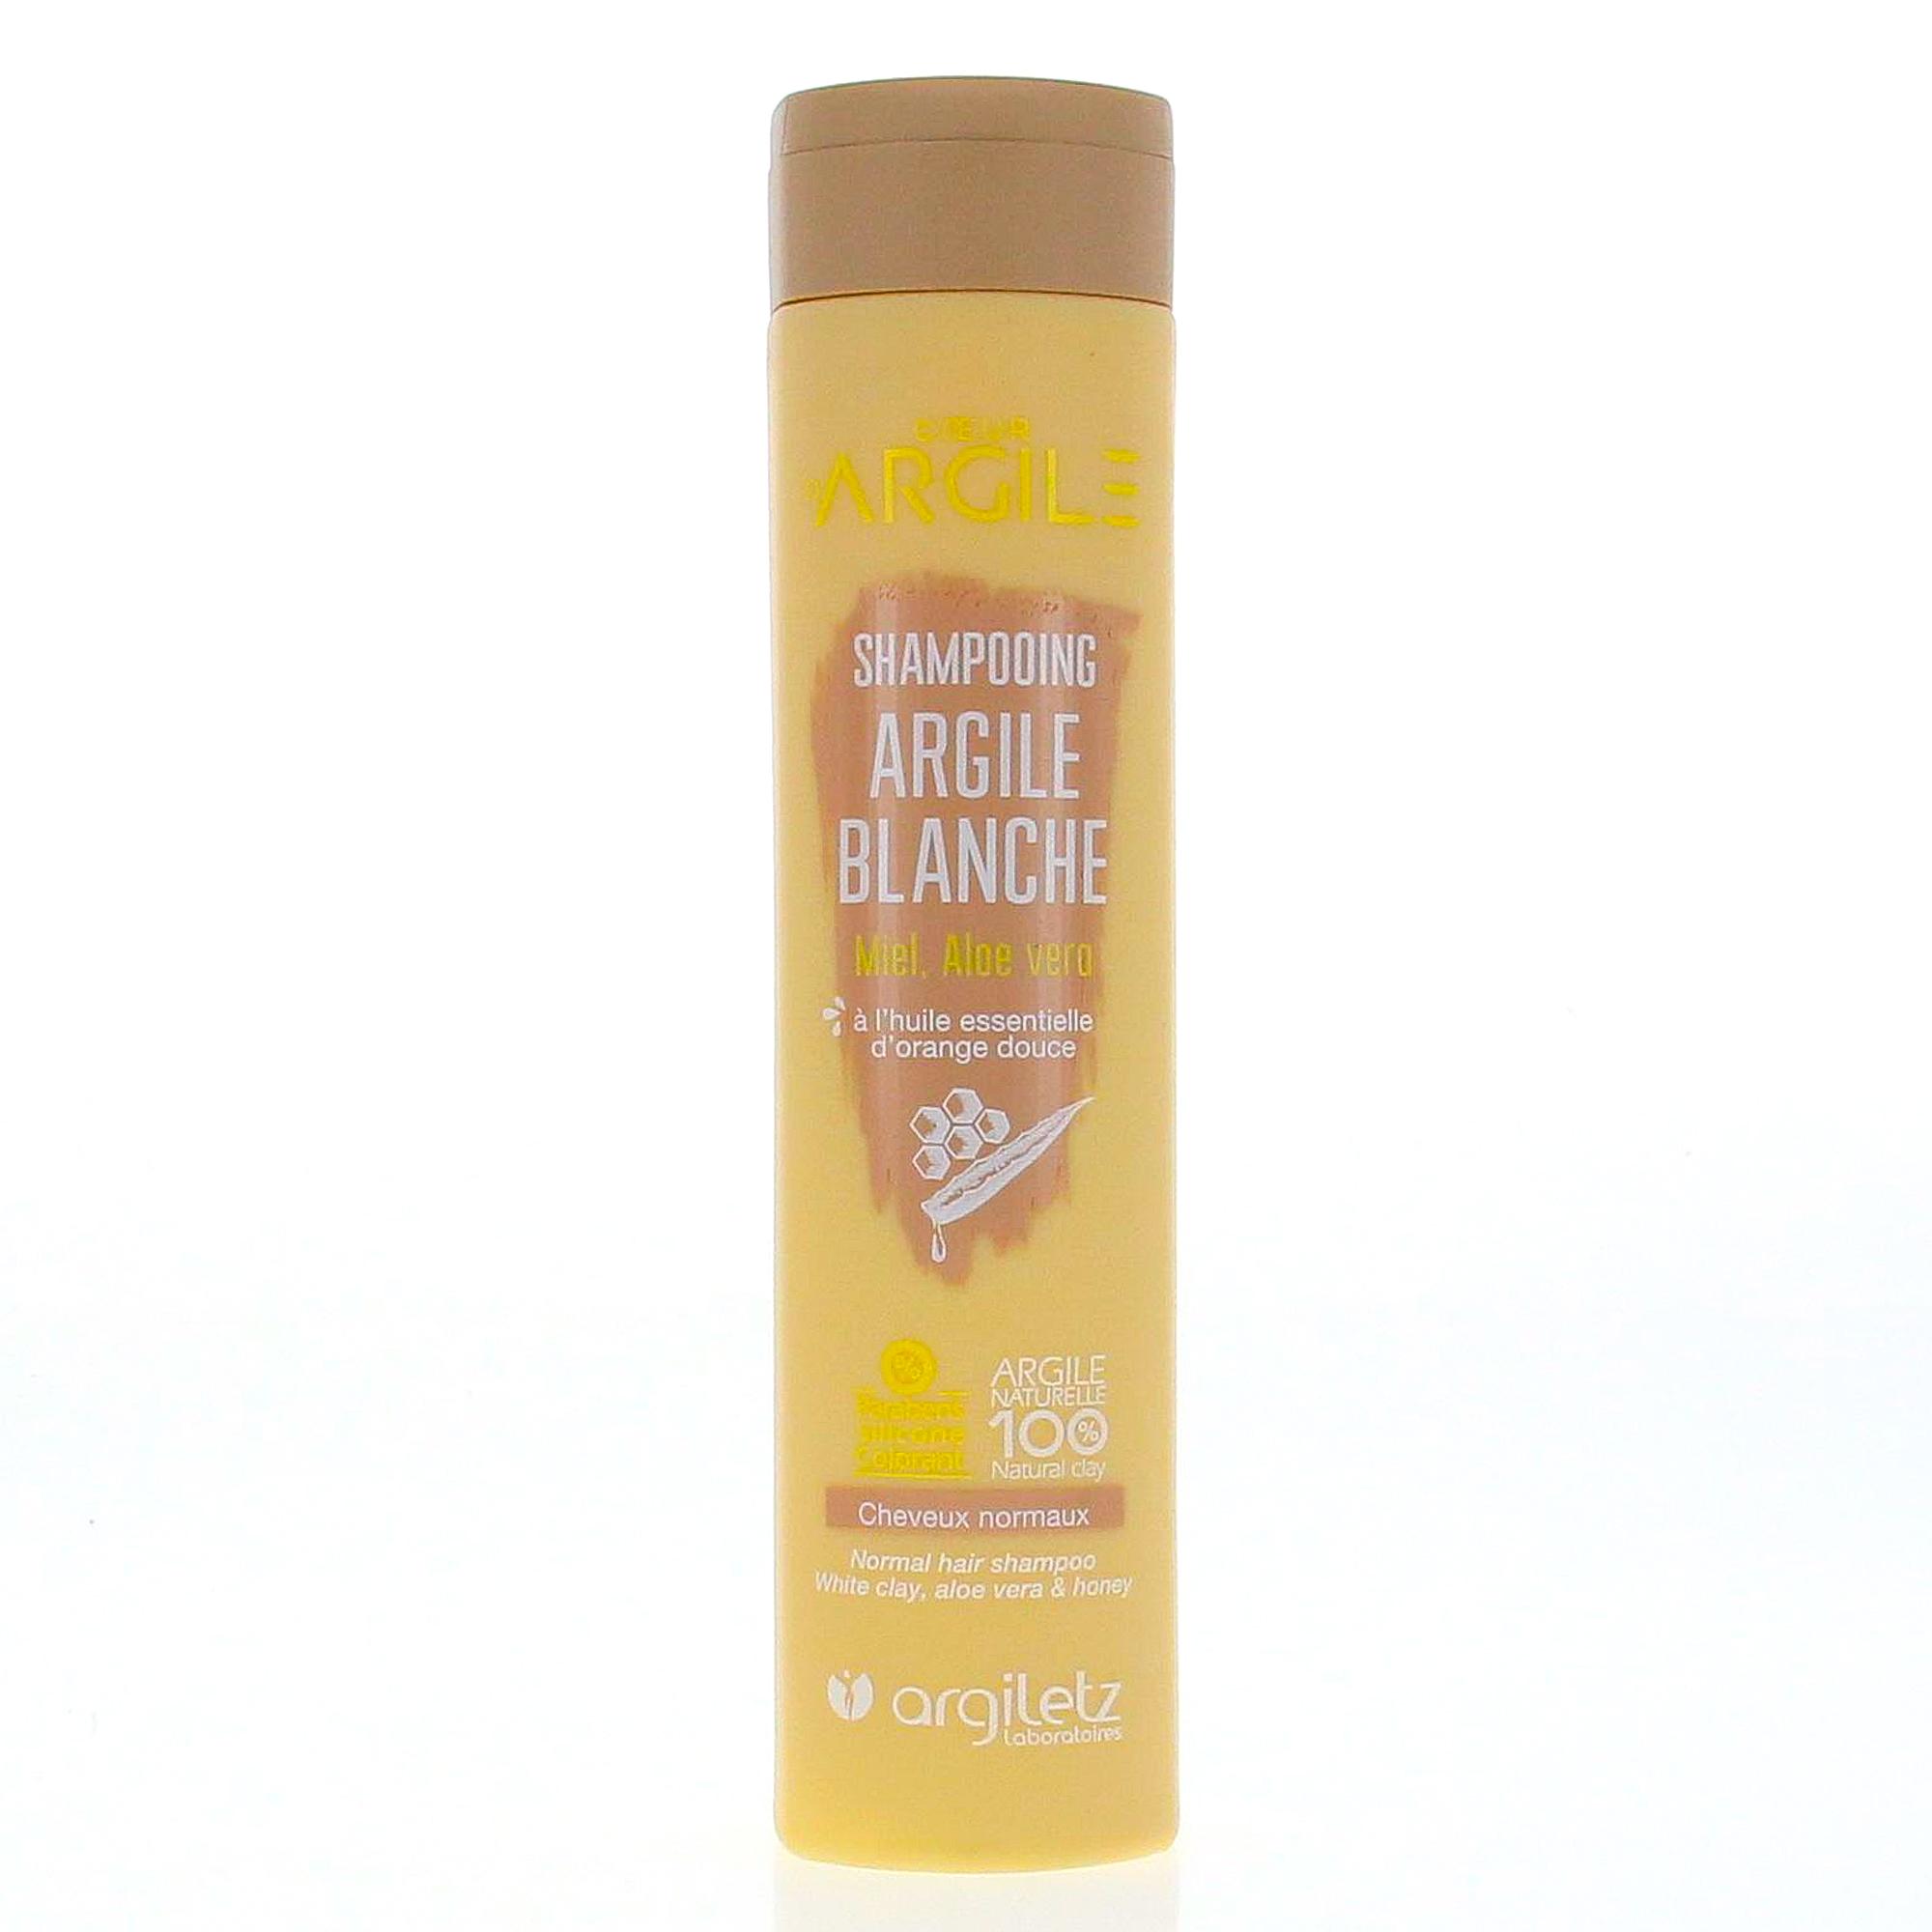 ARGILETZ Coeur d'Argile shampooing argile blanche flacon 200ml